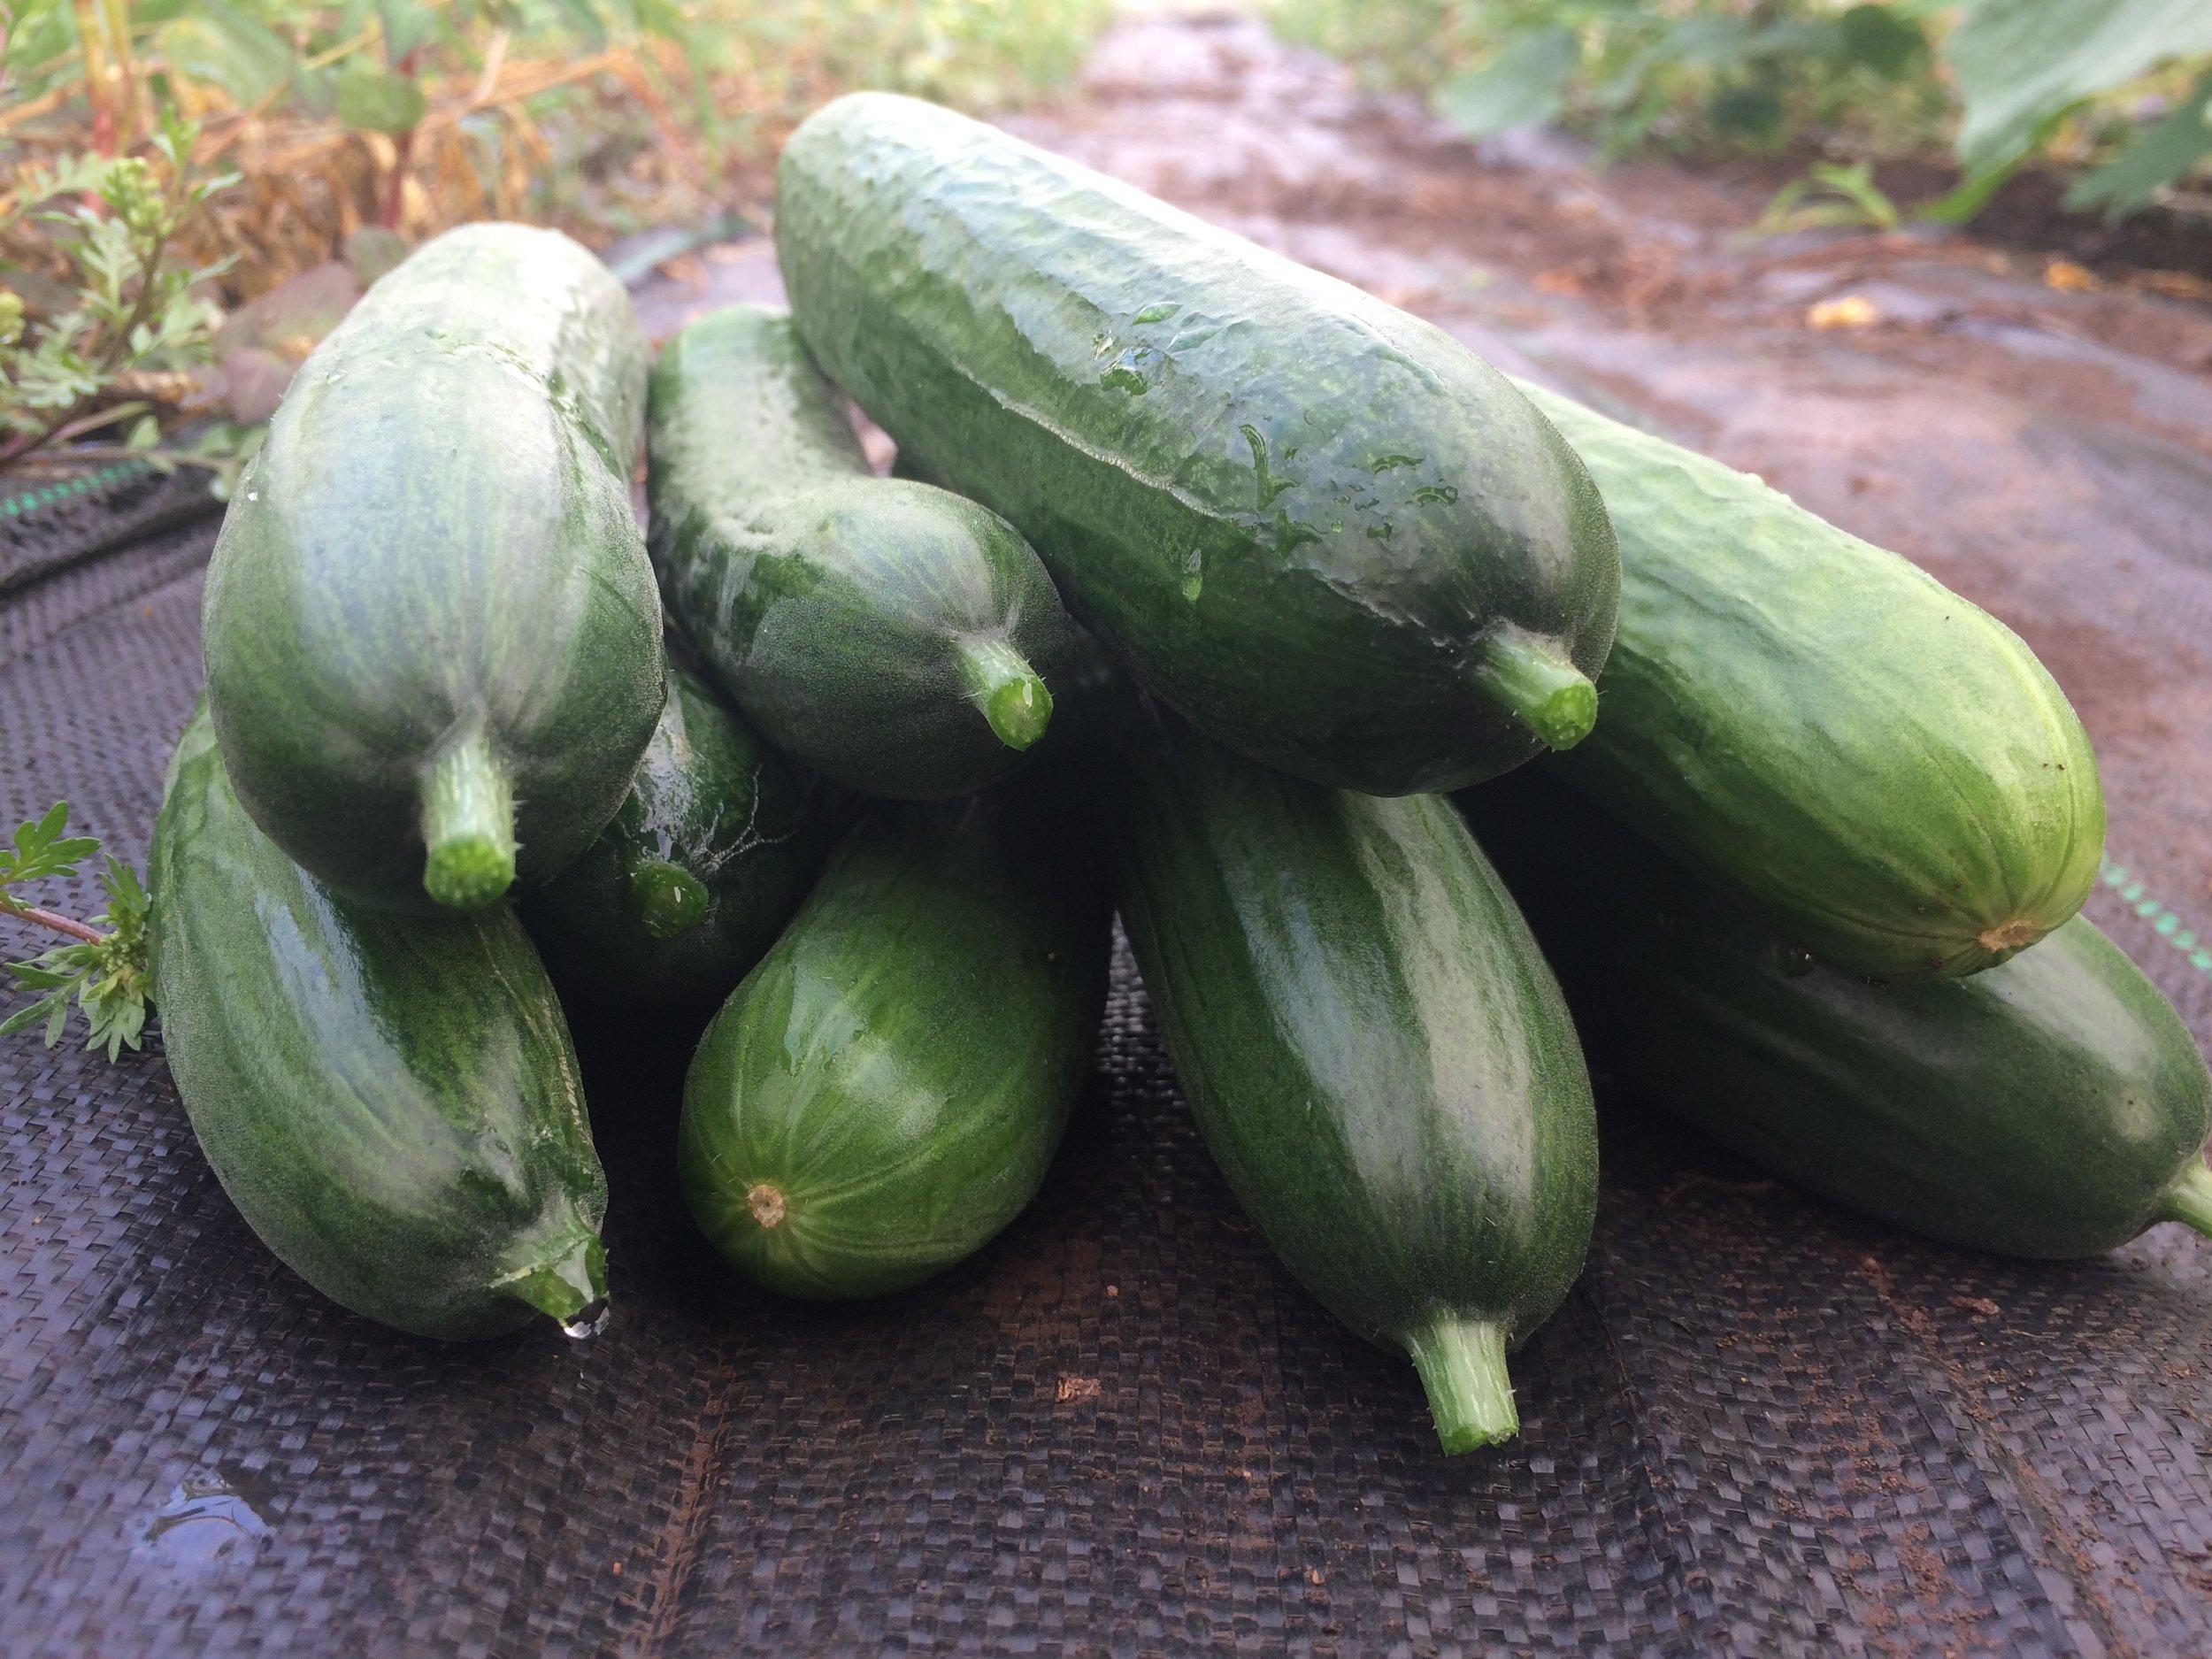 cucumber stack.JPG